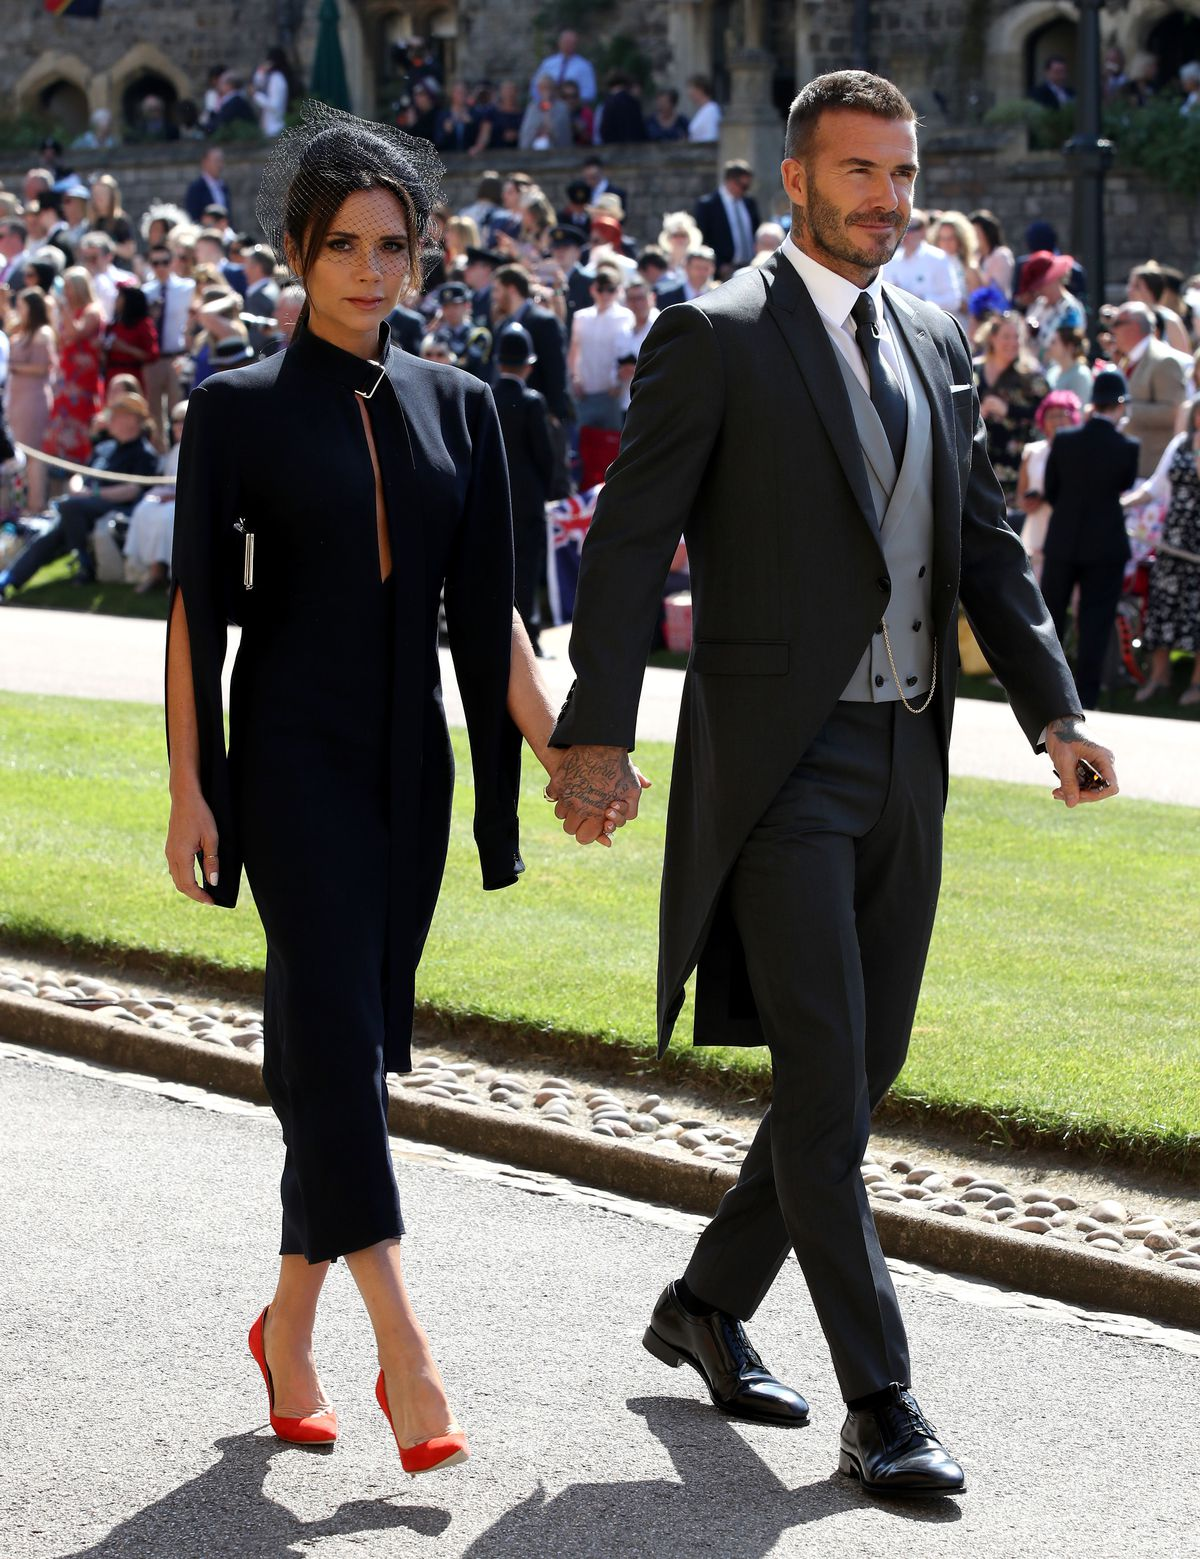 Oprah Winfrey Royal Wedding.Royal Wedding What Oprah And Other Celebrities Wore Racked